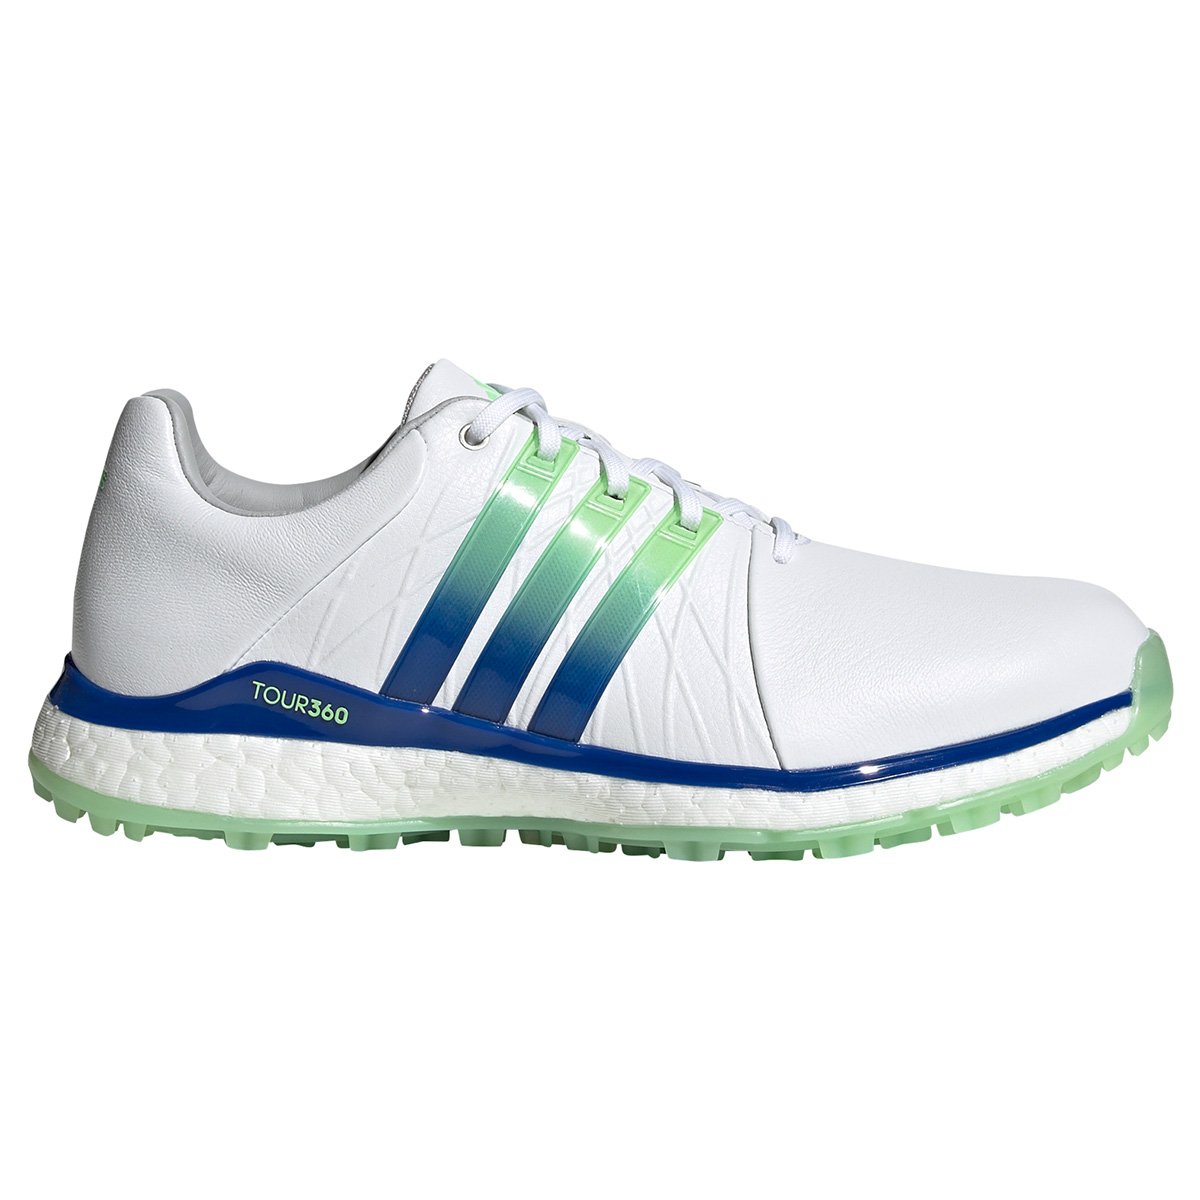 Monótono Tradicional marca  adidas Golf Tour 360 XT-SL Ladies Shoes from american golf